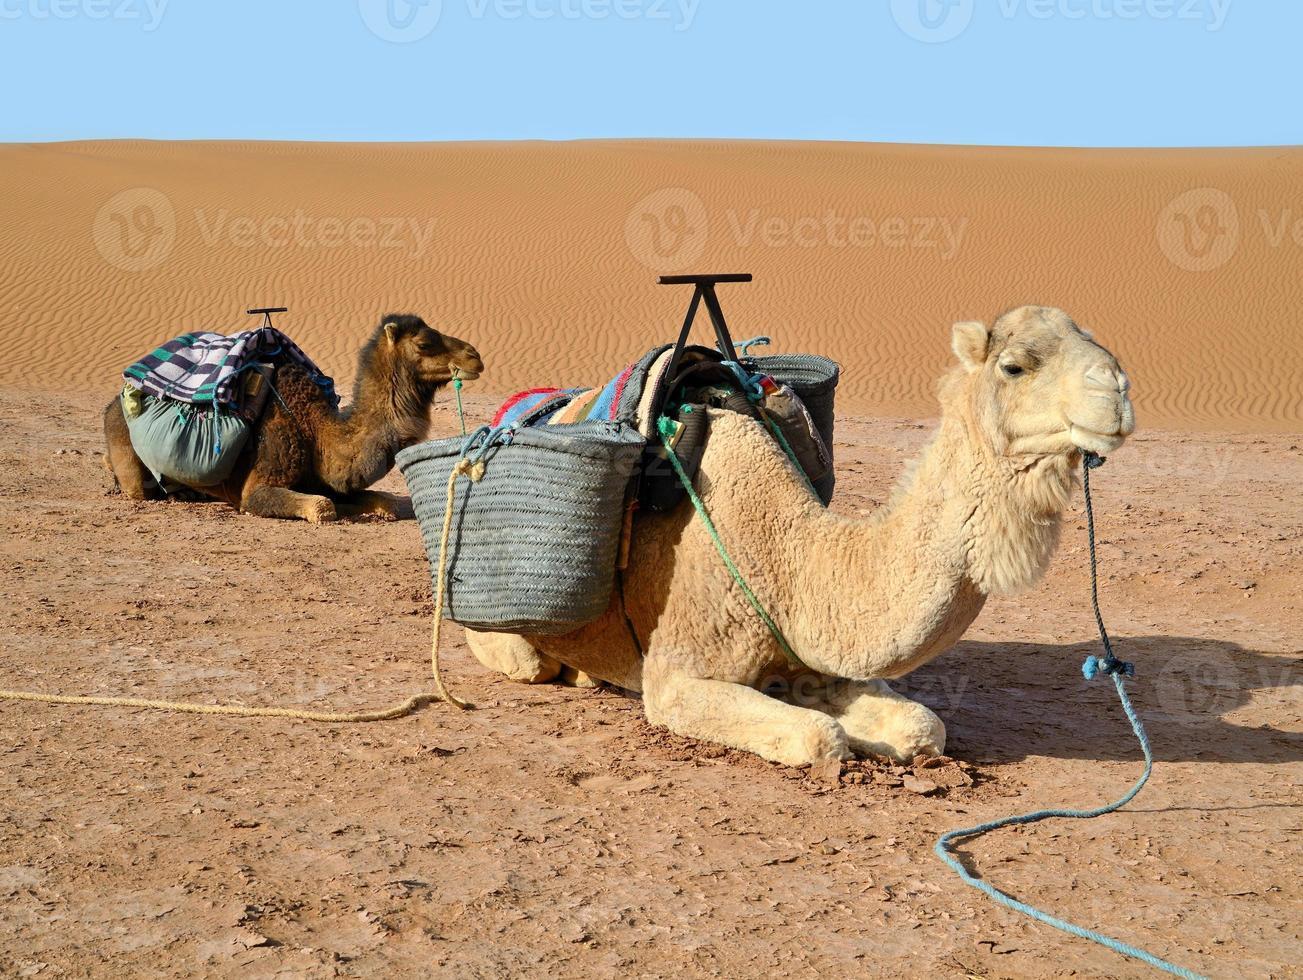 Camels in desert photo